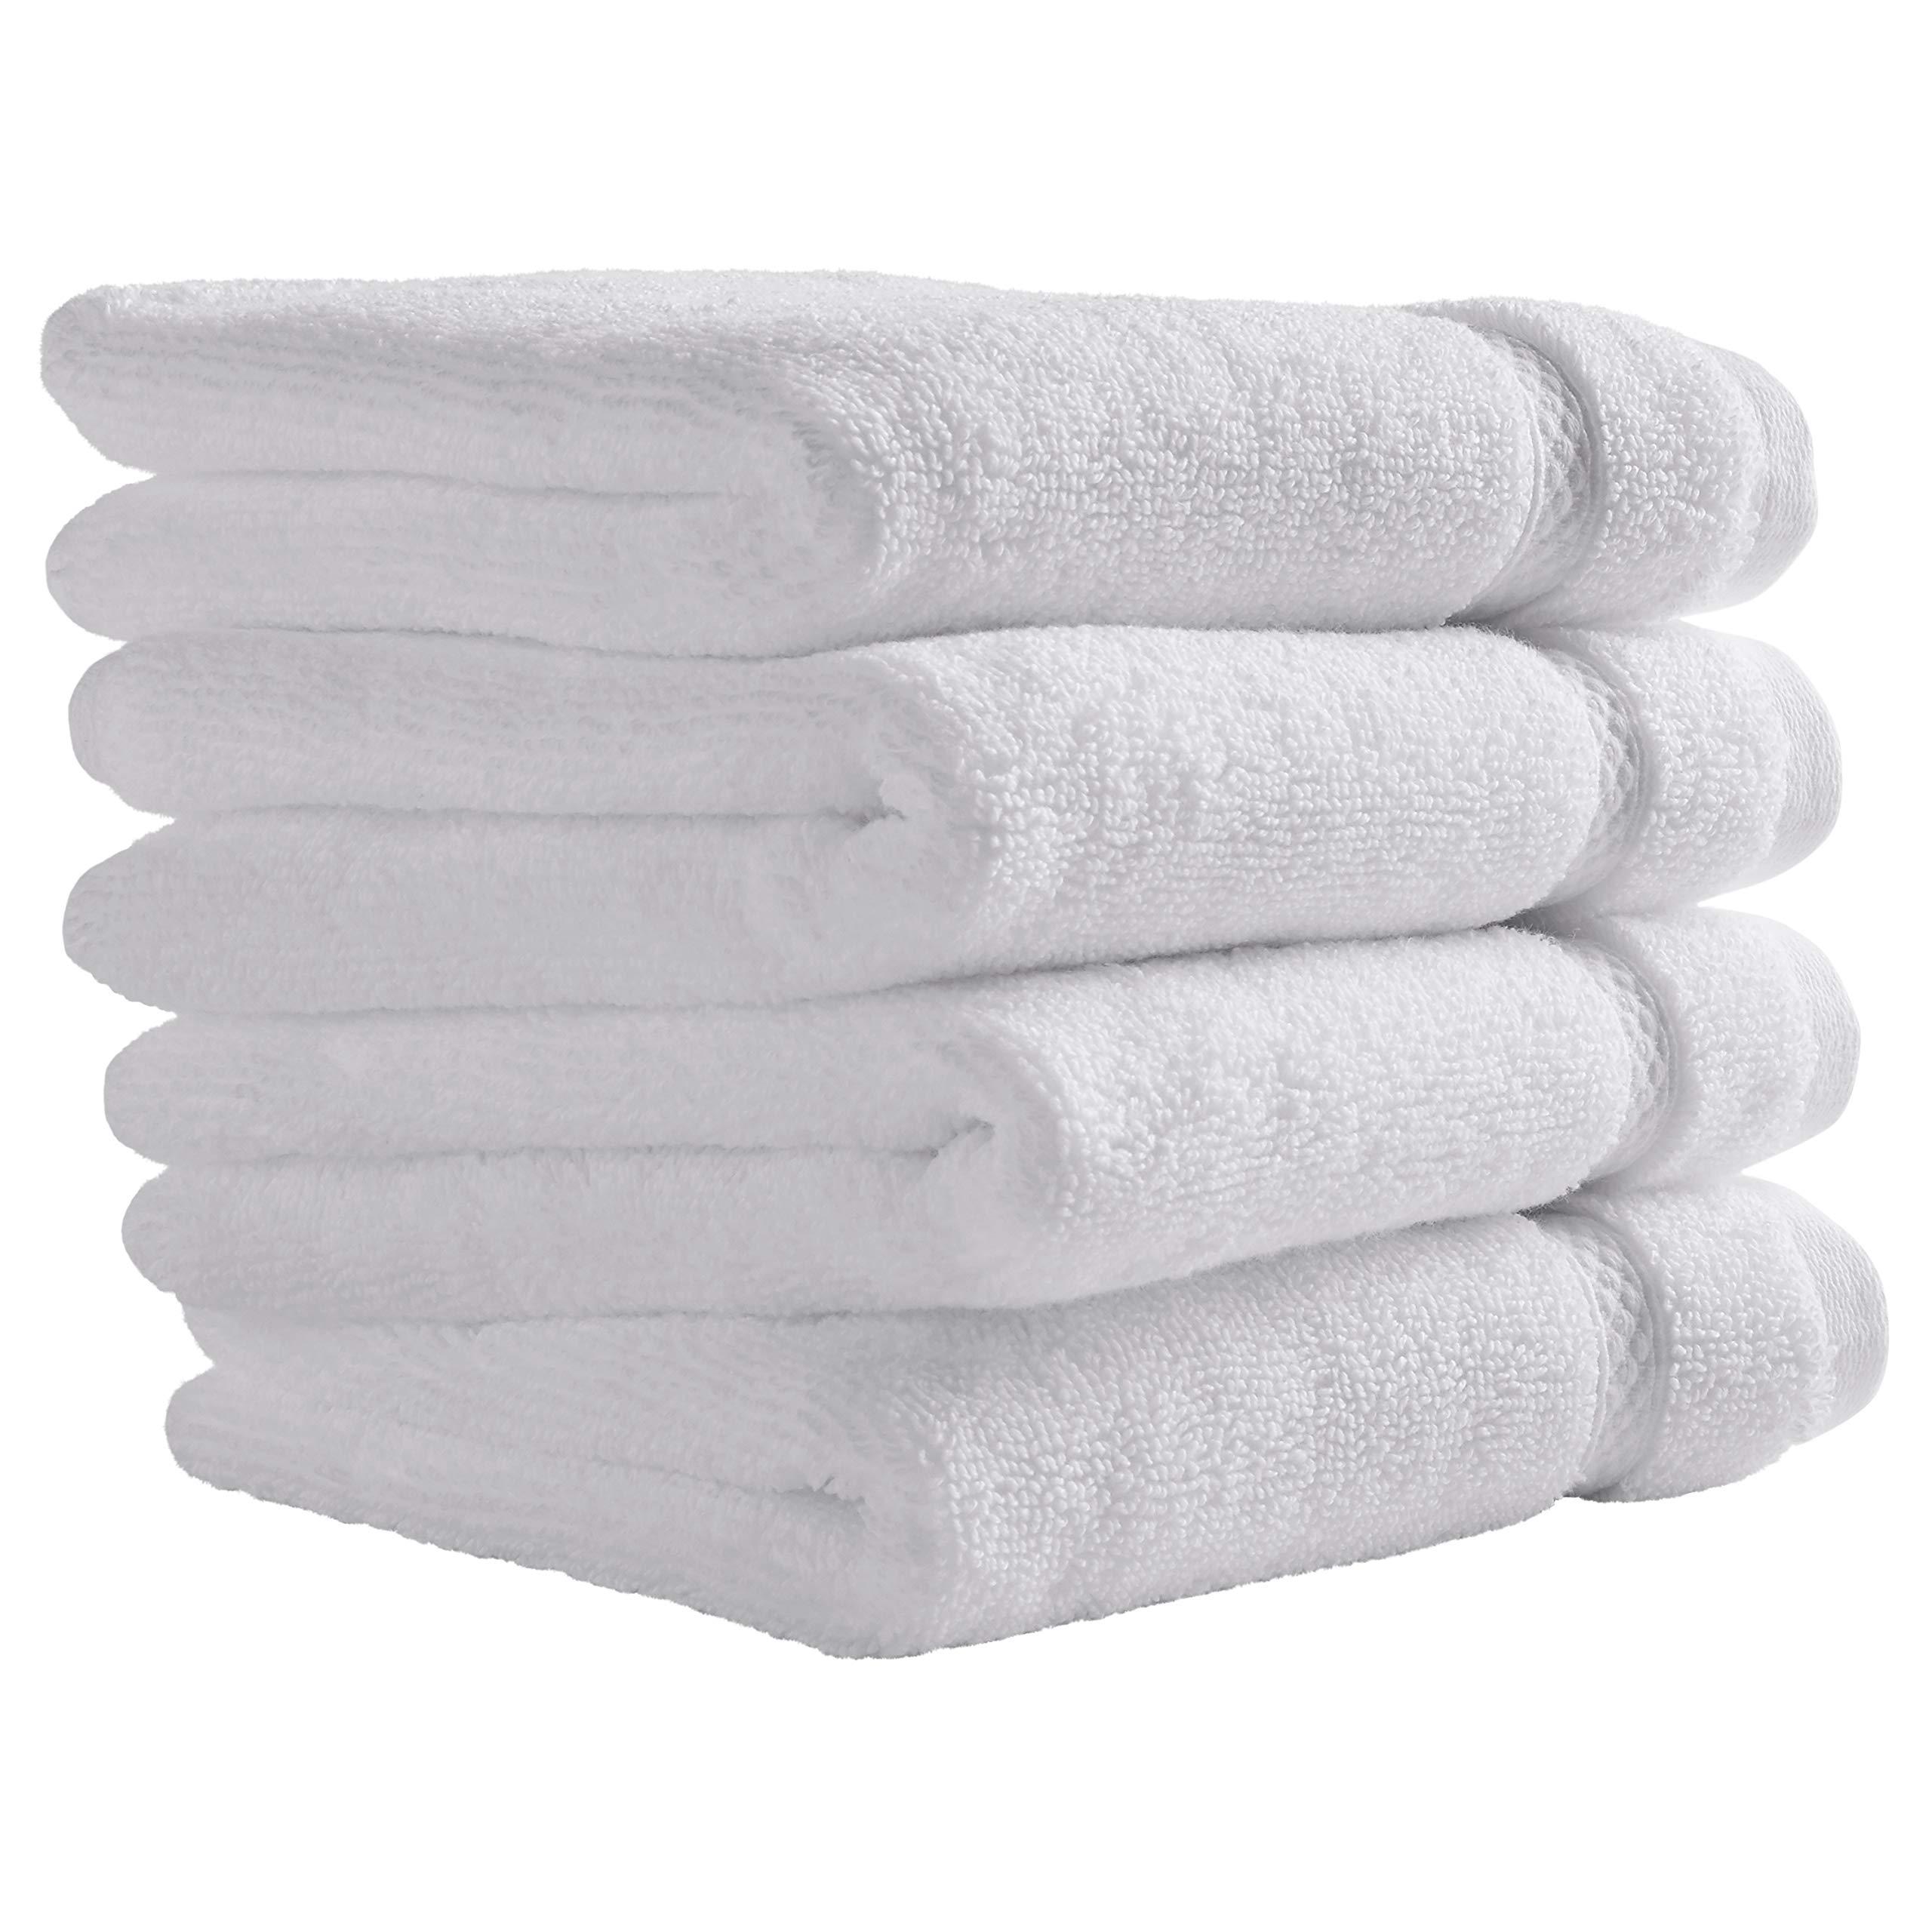 Stone & Beam Heavyweight Turkish Cotton Washcloth Set, Set of 4, White